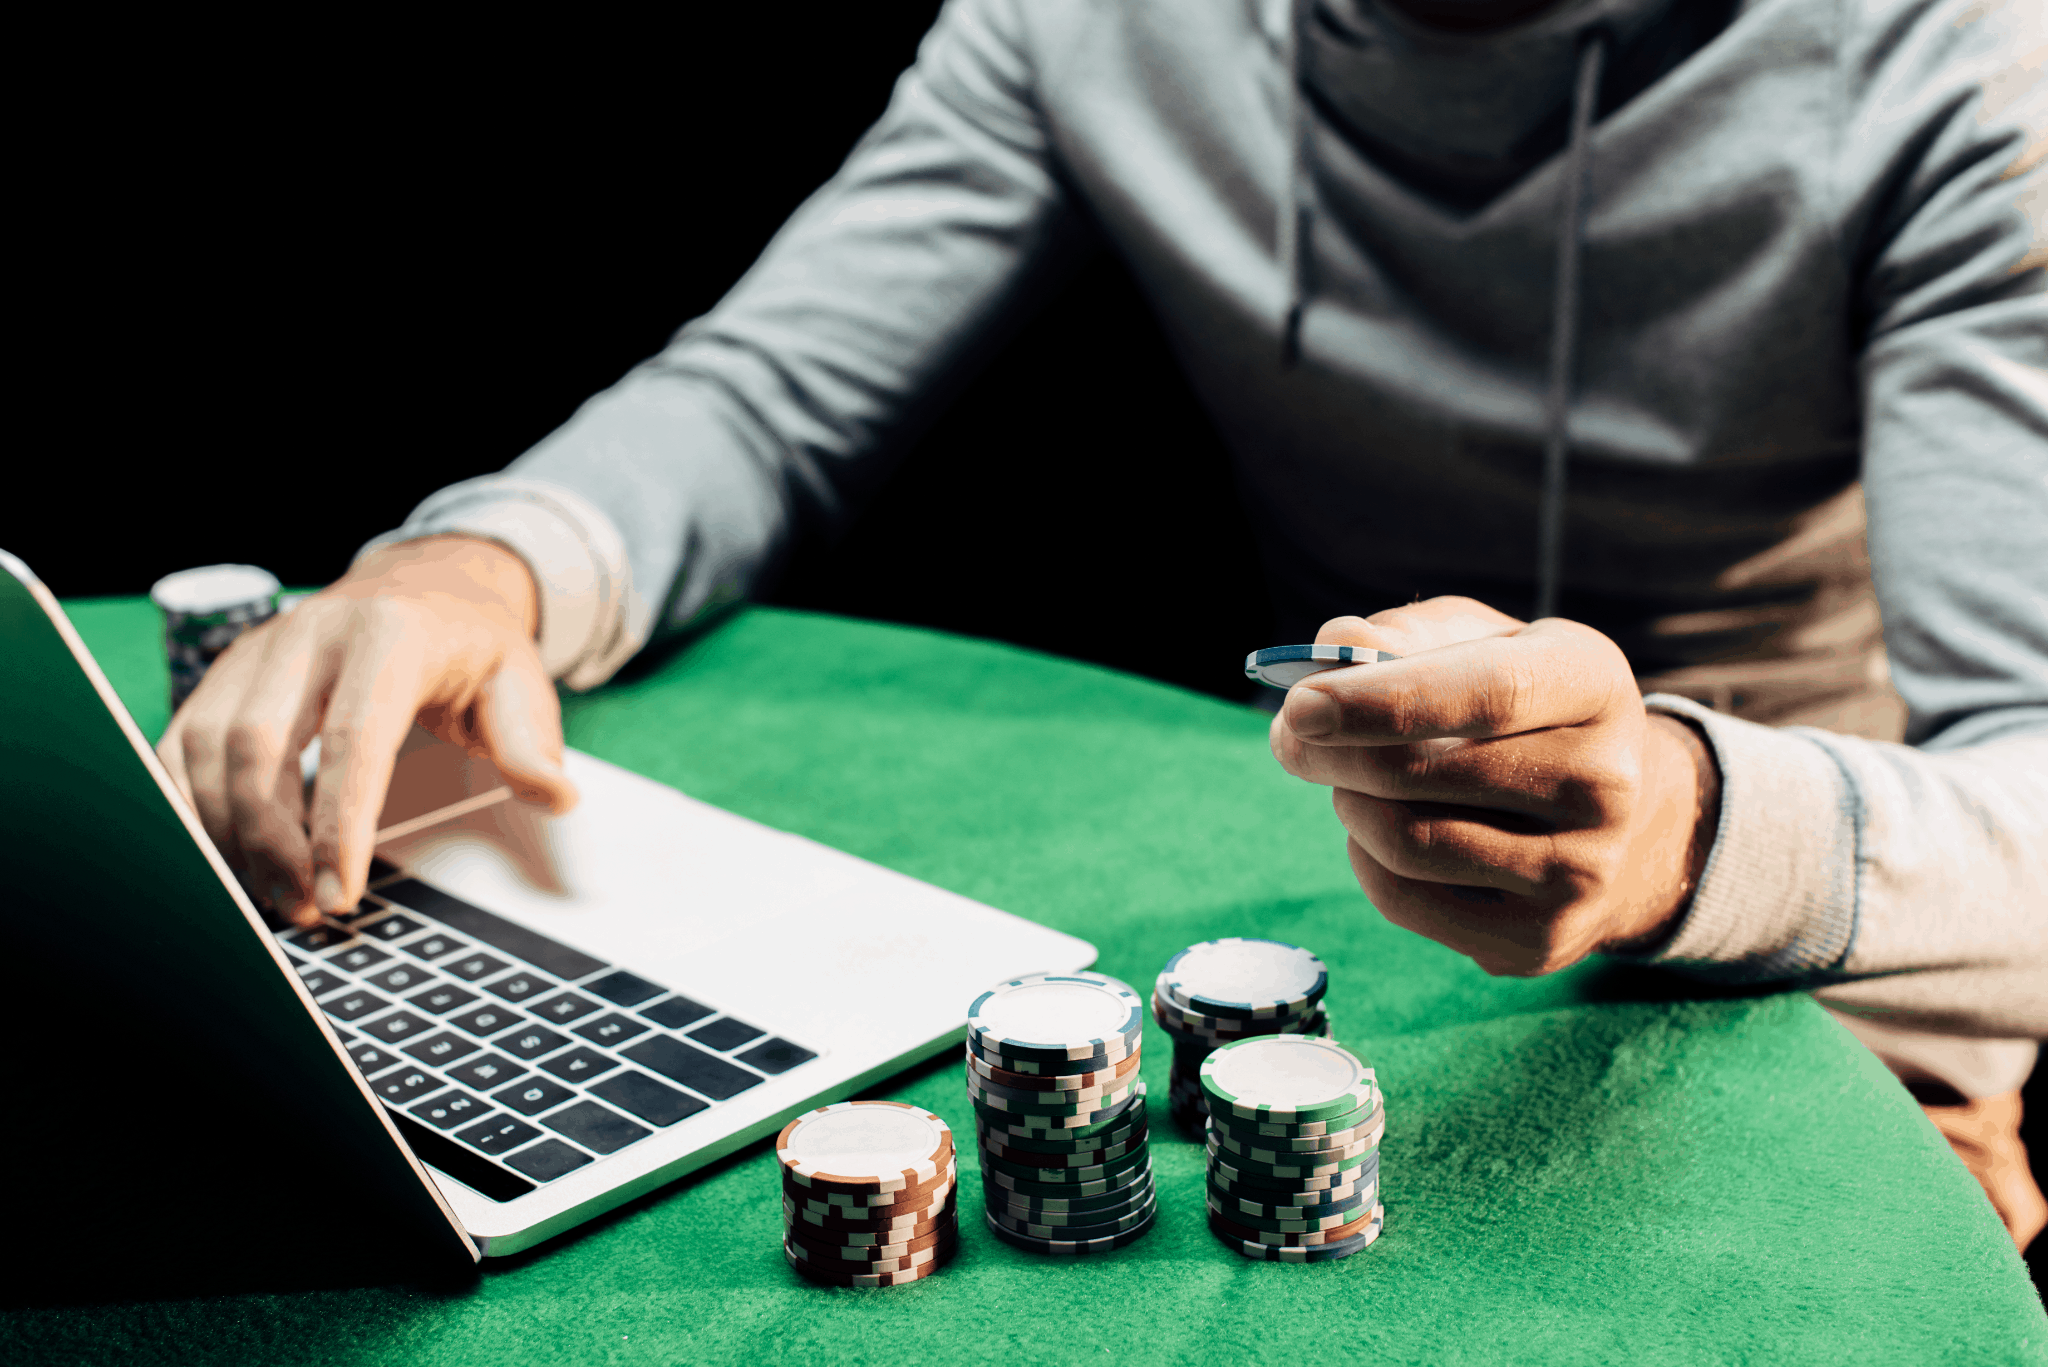 poker chips near laptop